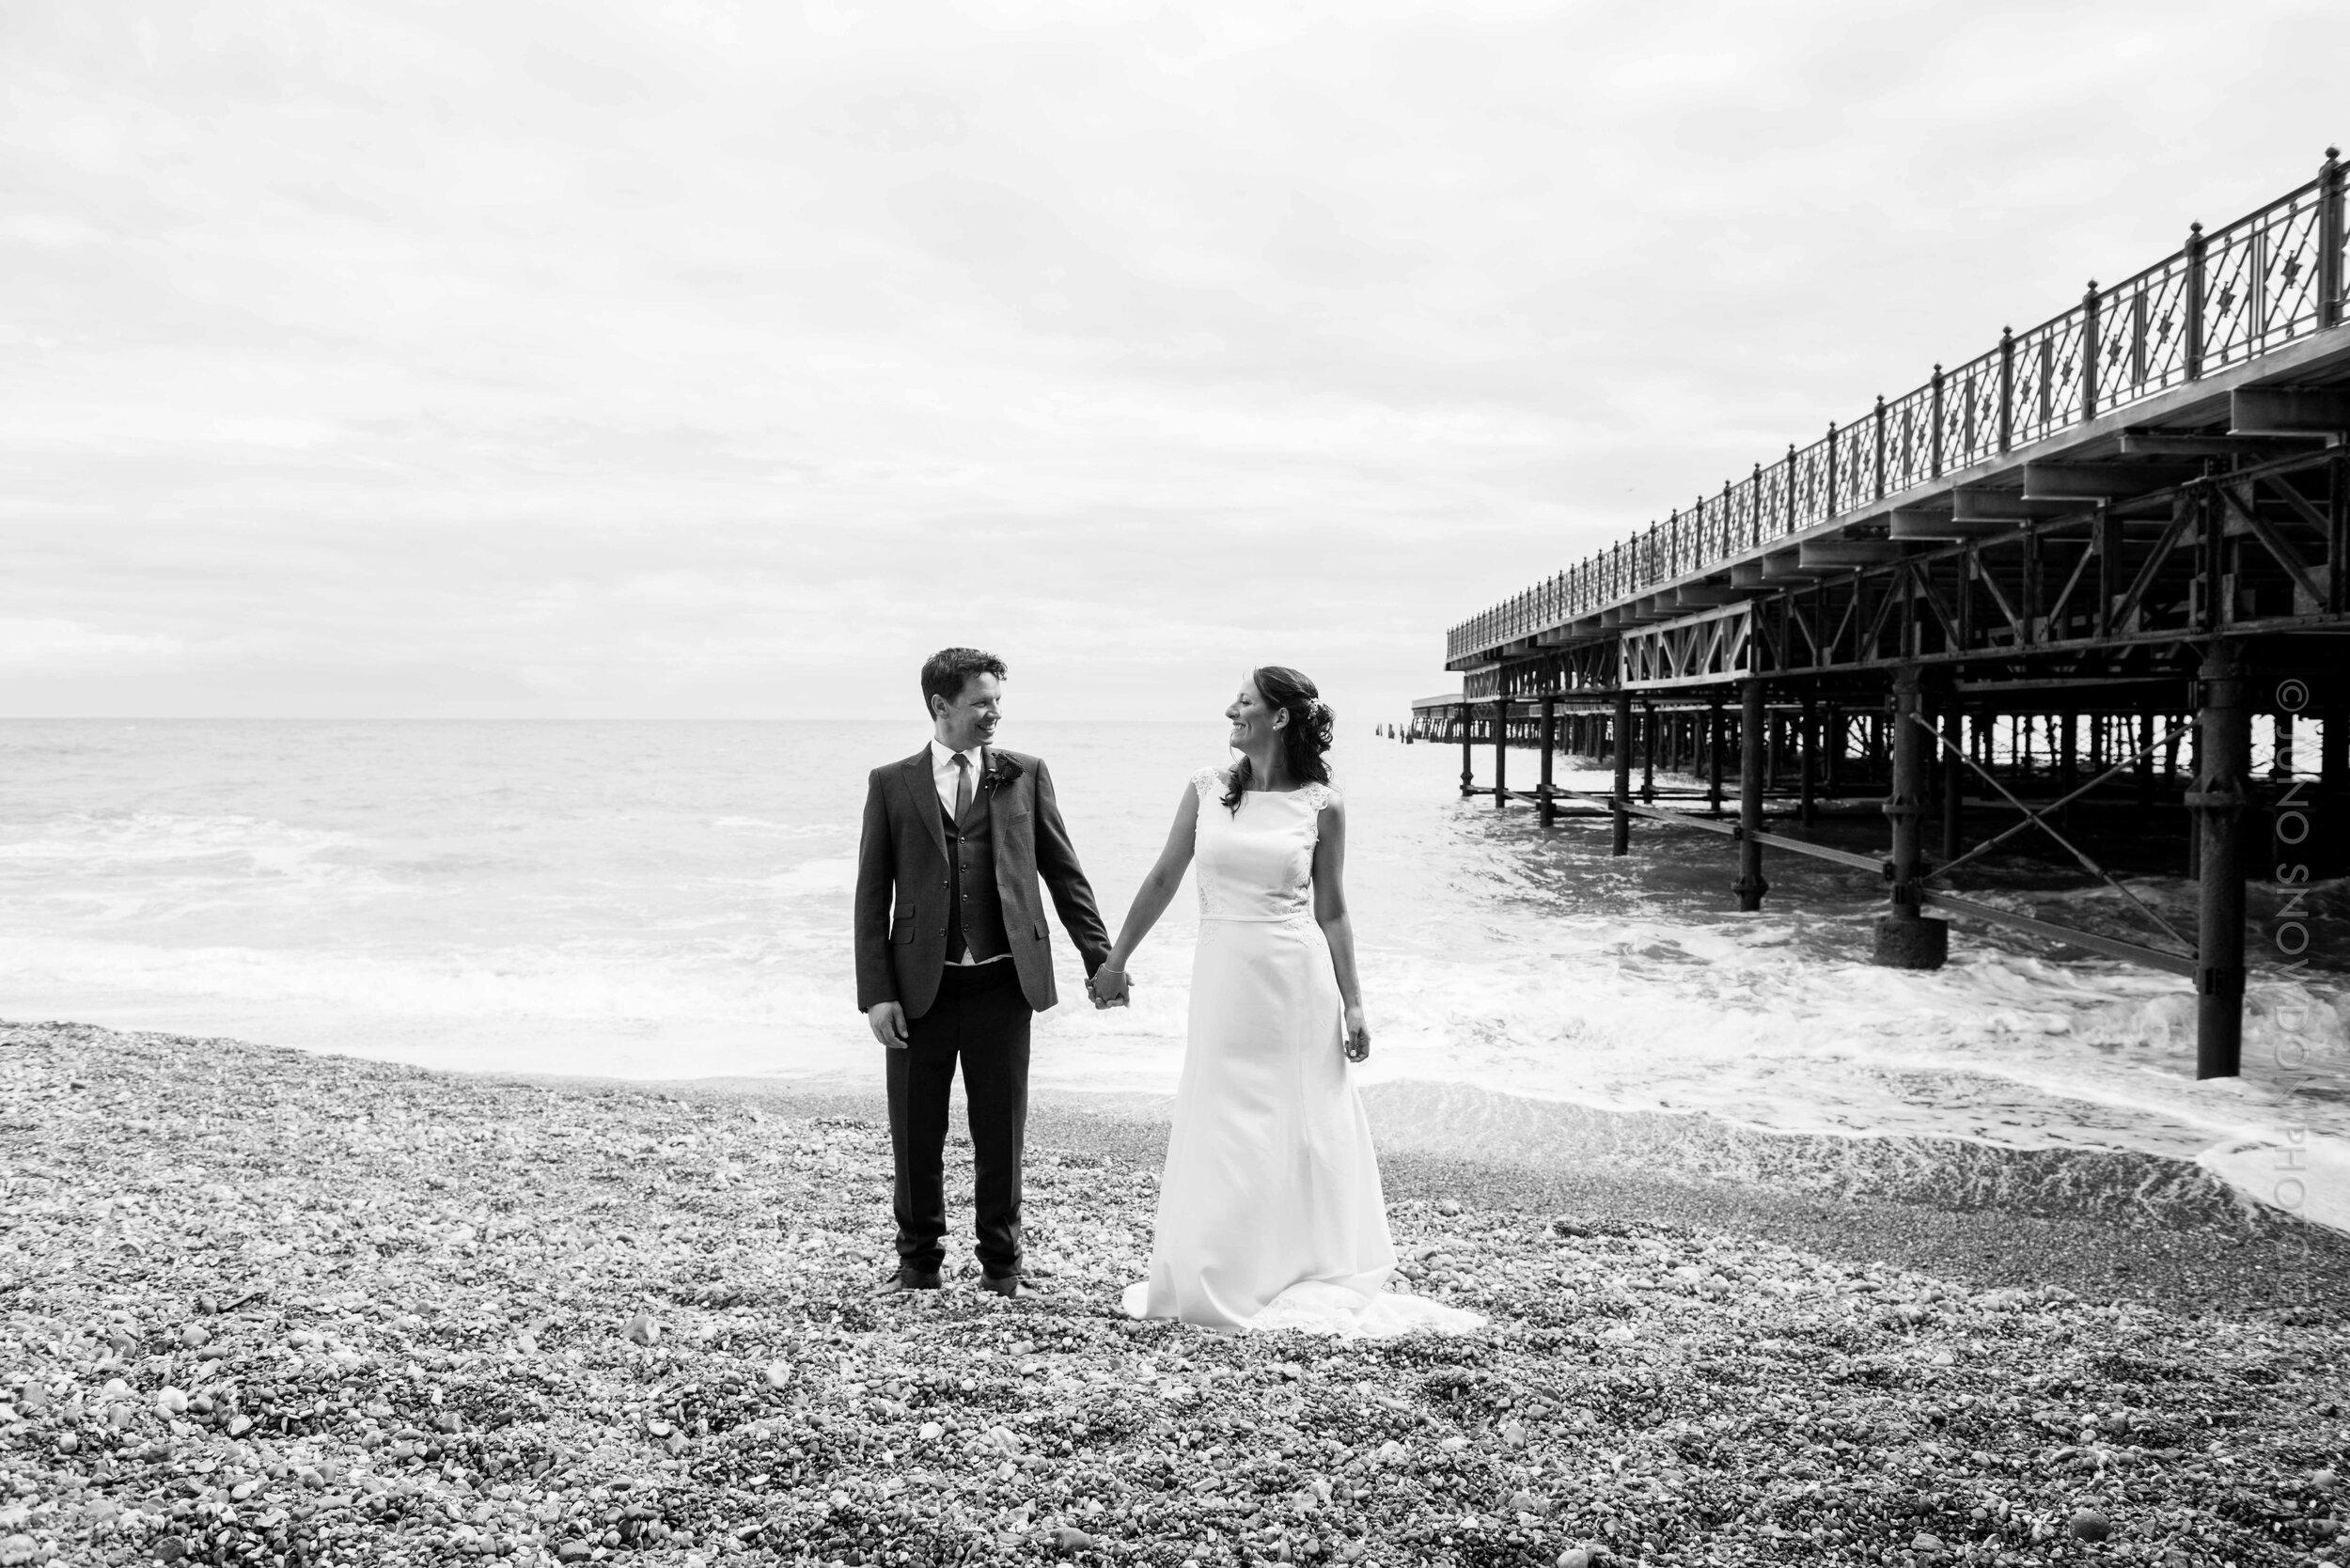 juno-snowdon-photography-wedding-7643.jpg